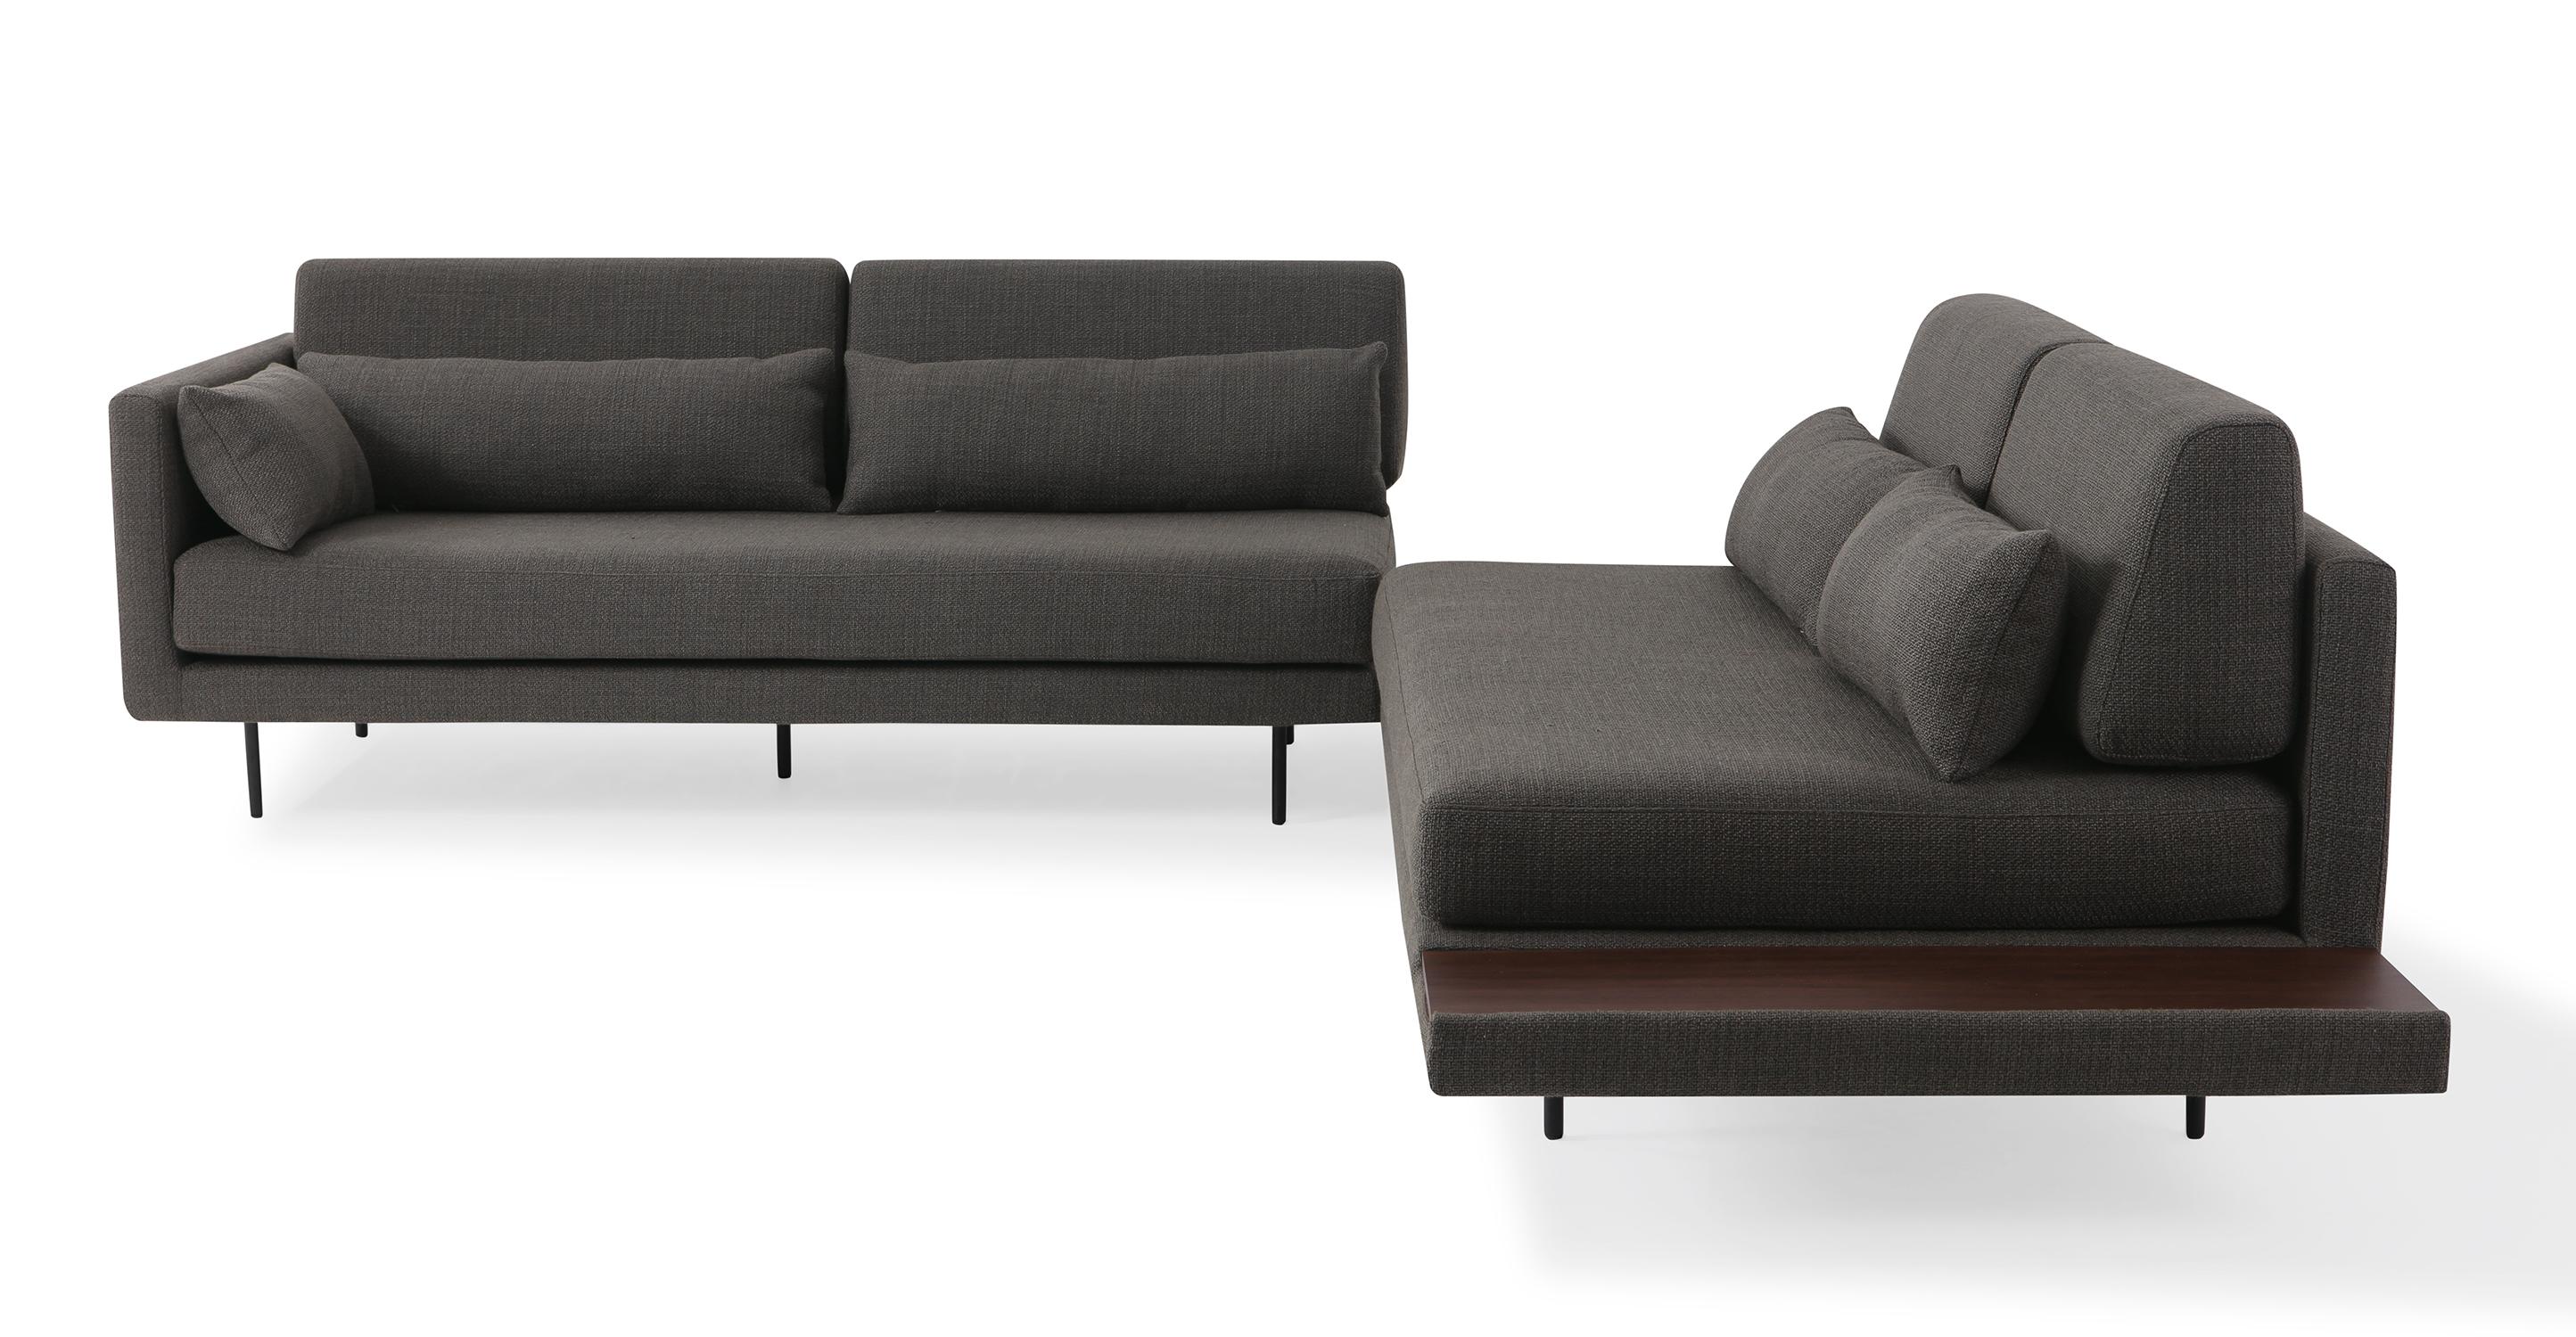 "Davenport 110"" Fabric L-Corner Table Sectional, Nuit Boucle"